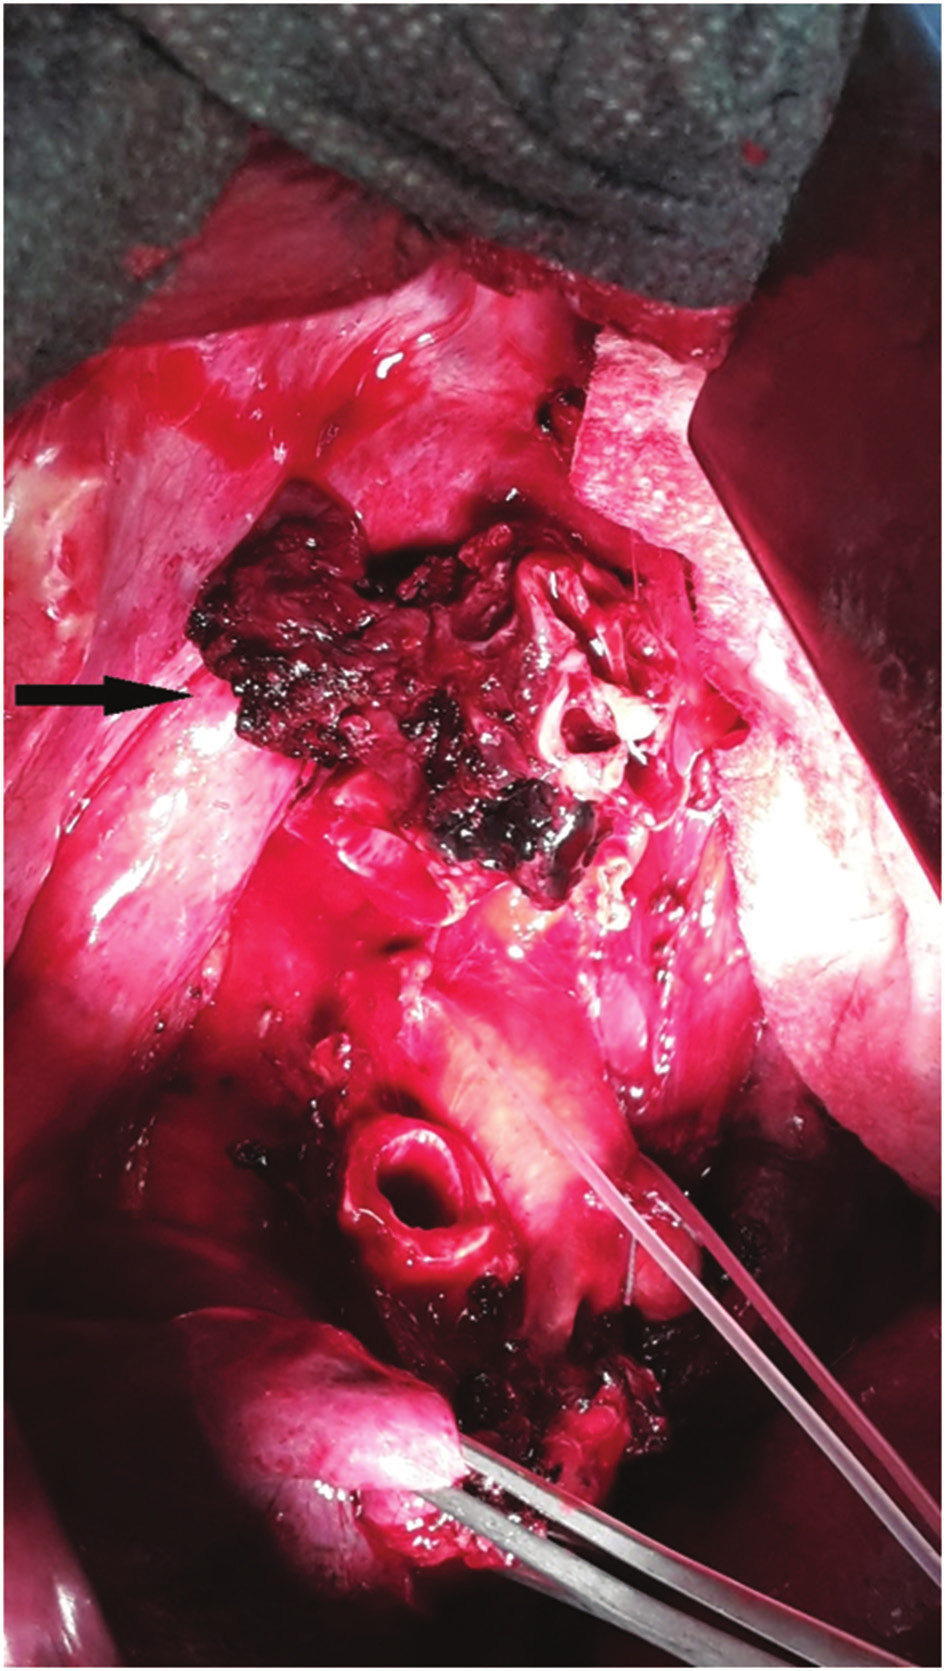 Nádorové postižení kariny, stav po horní lobektomii vpravo Fig. 3: Tumor of the carina; status after right upper lobectomy